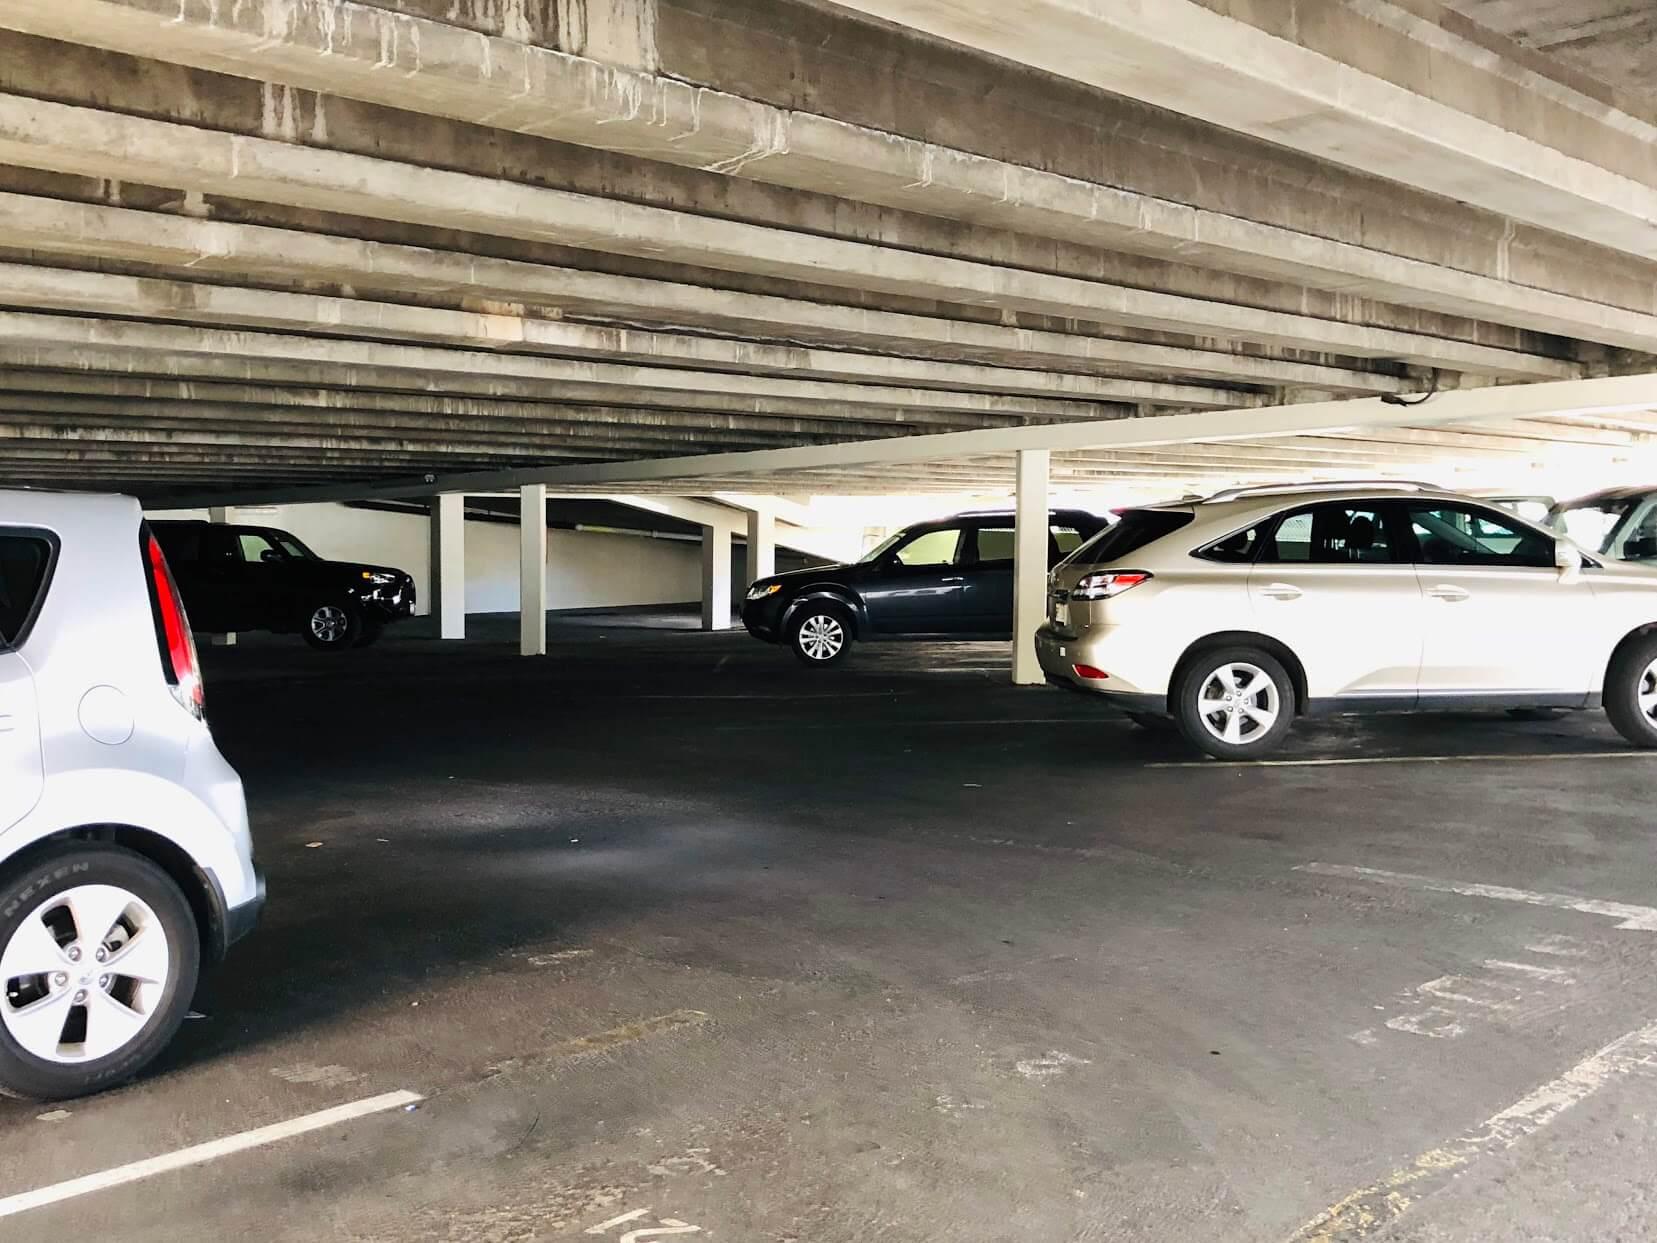 Ala Wai Coveの駐車場